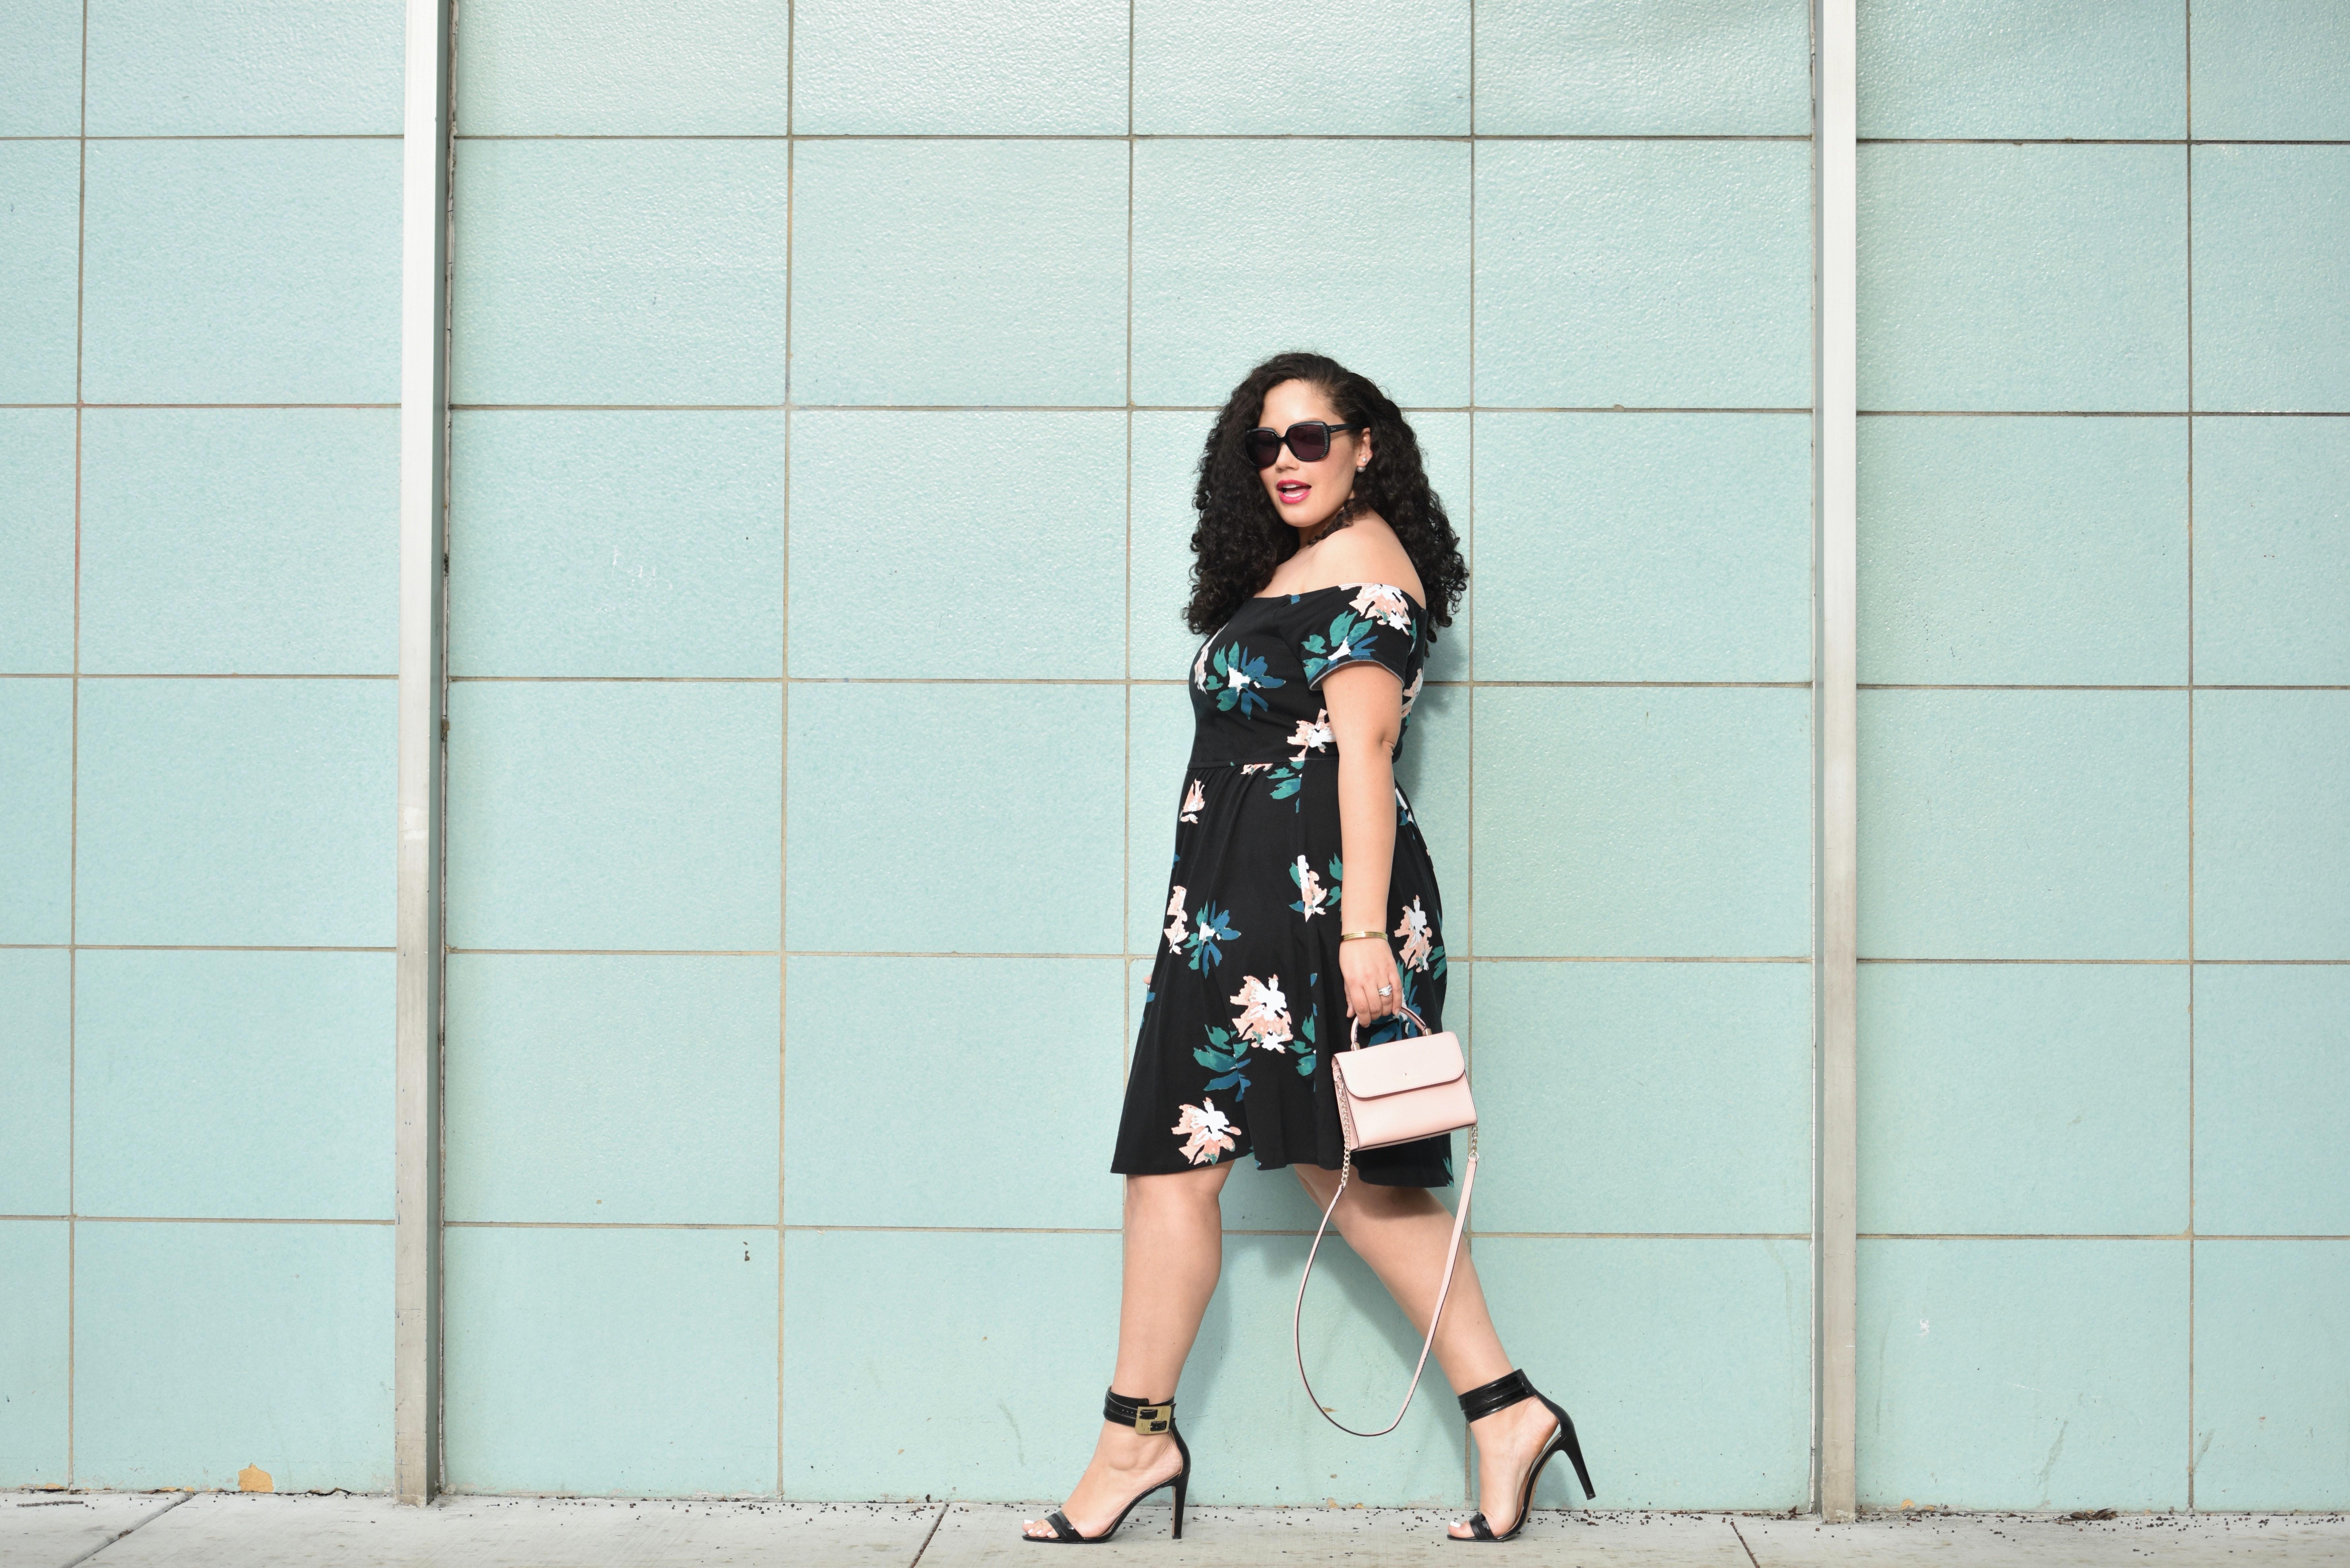 Curvy Women In Heels